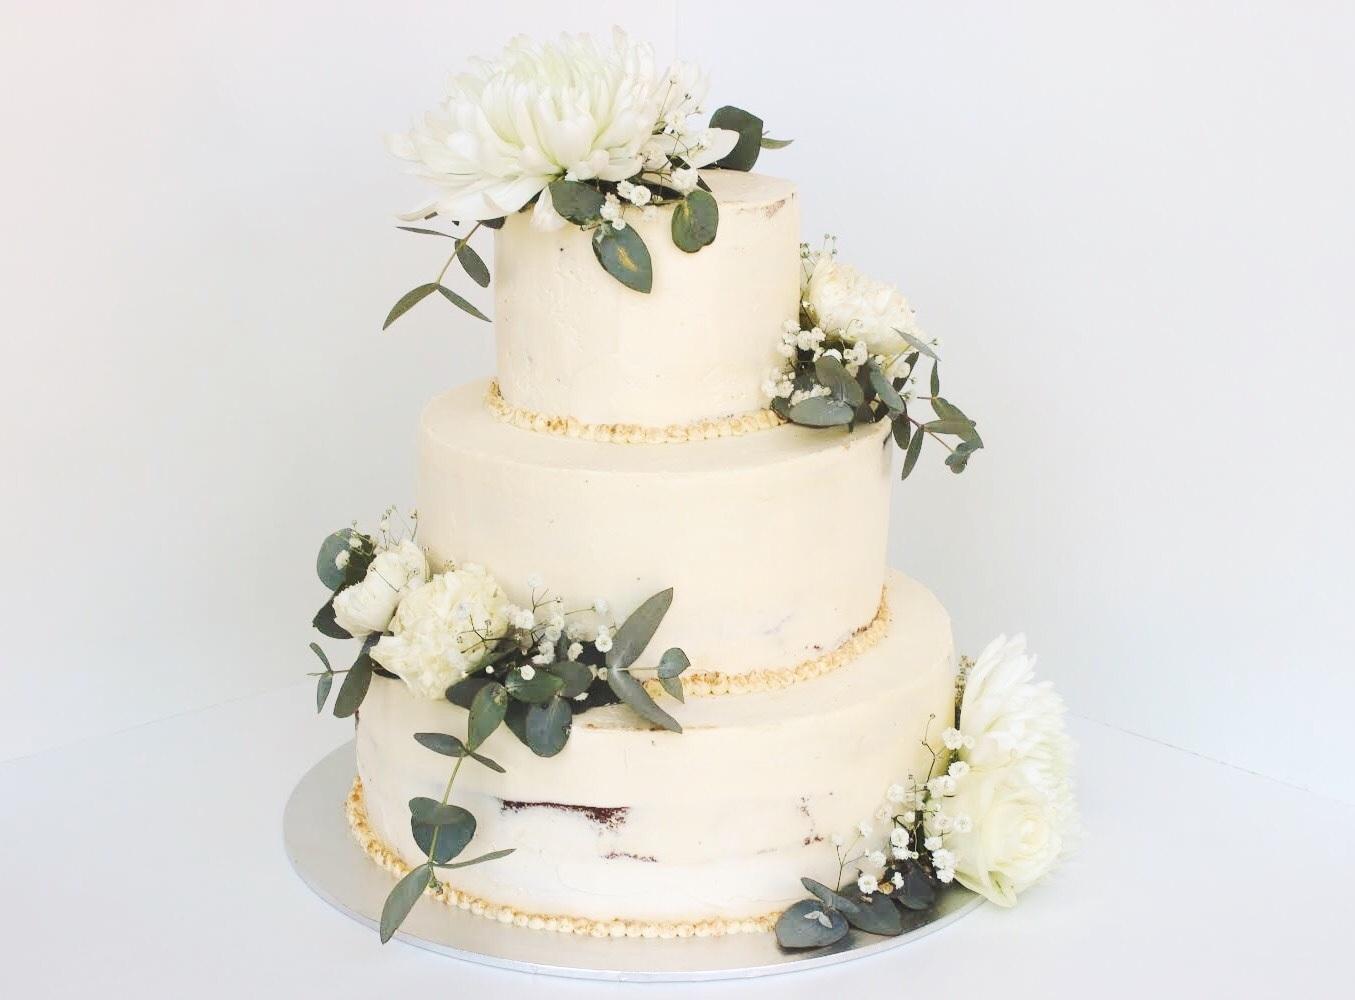 Vanilla Wedding Cake with Vanilla Cream